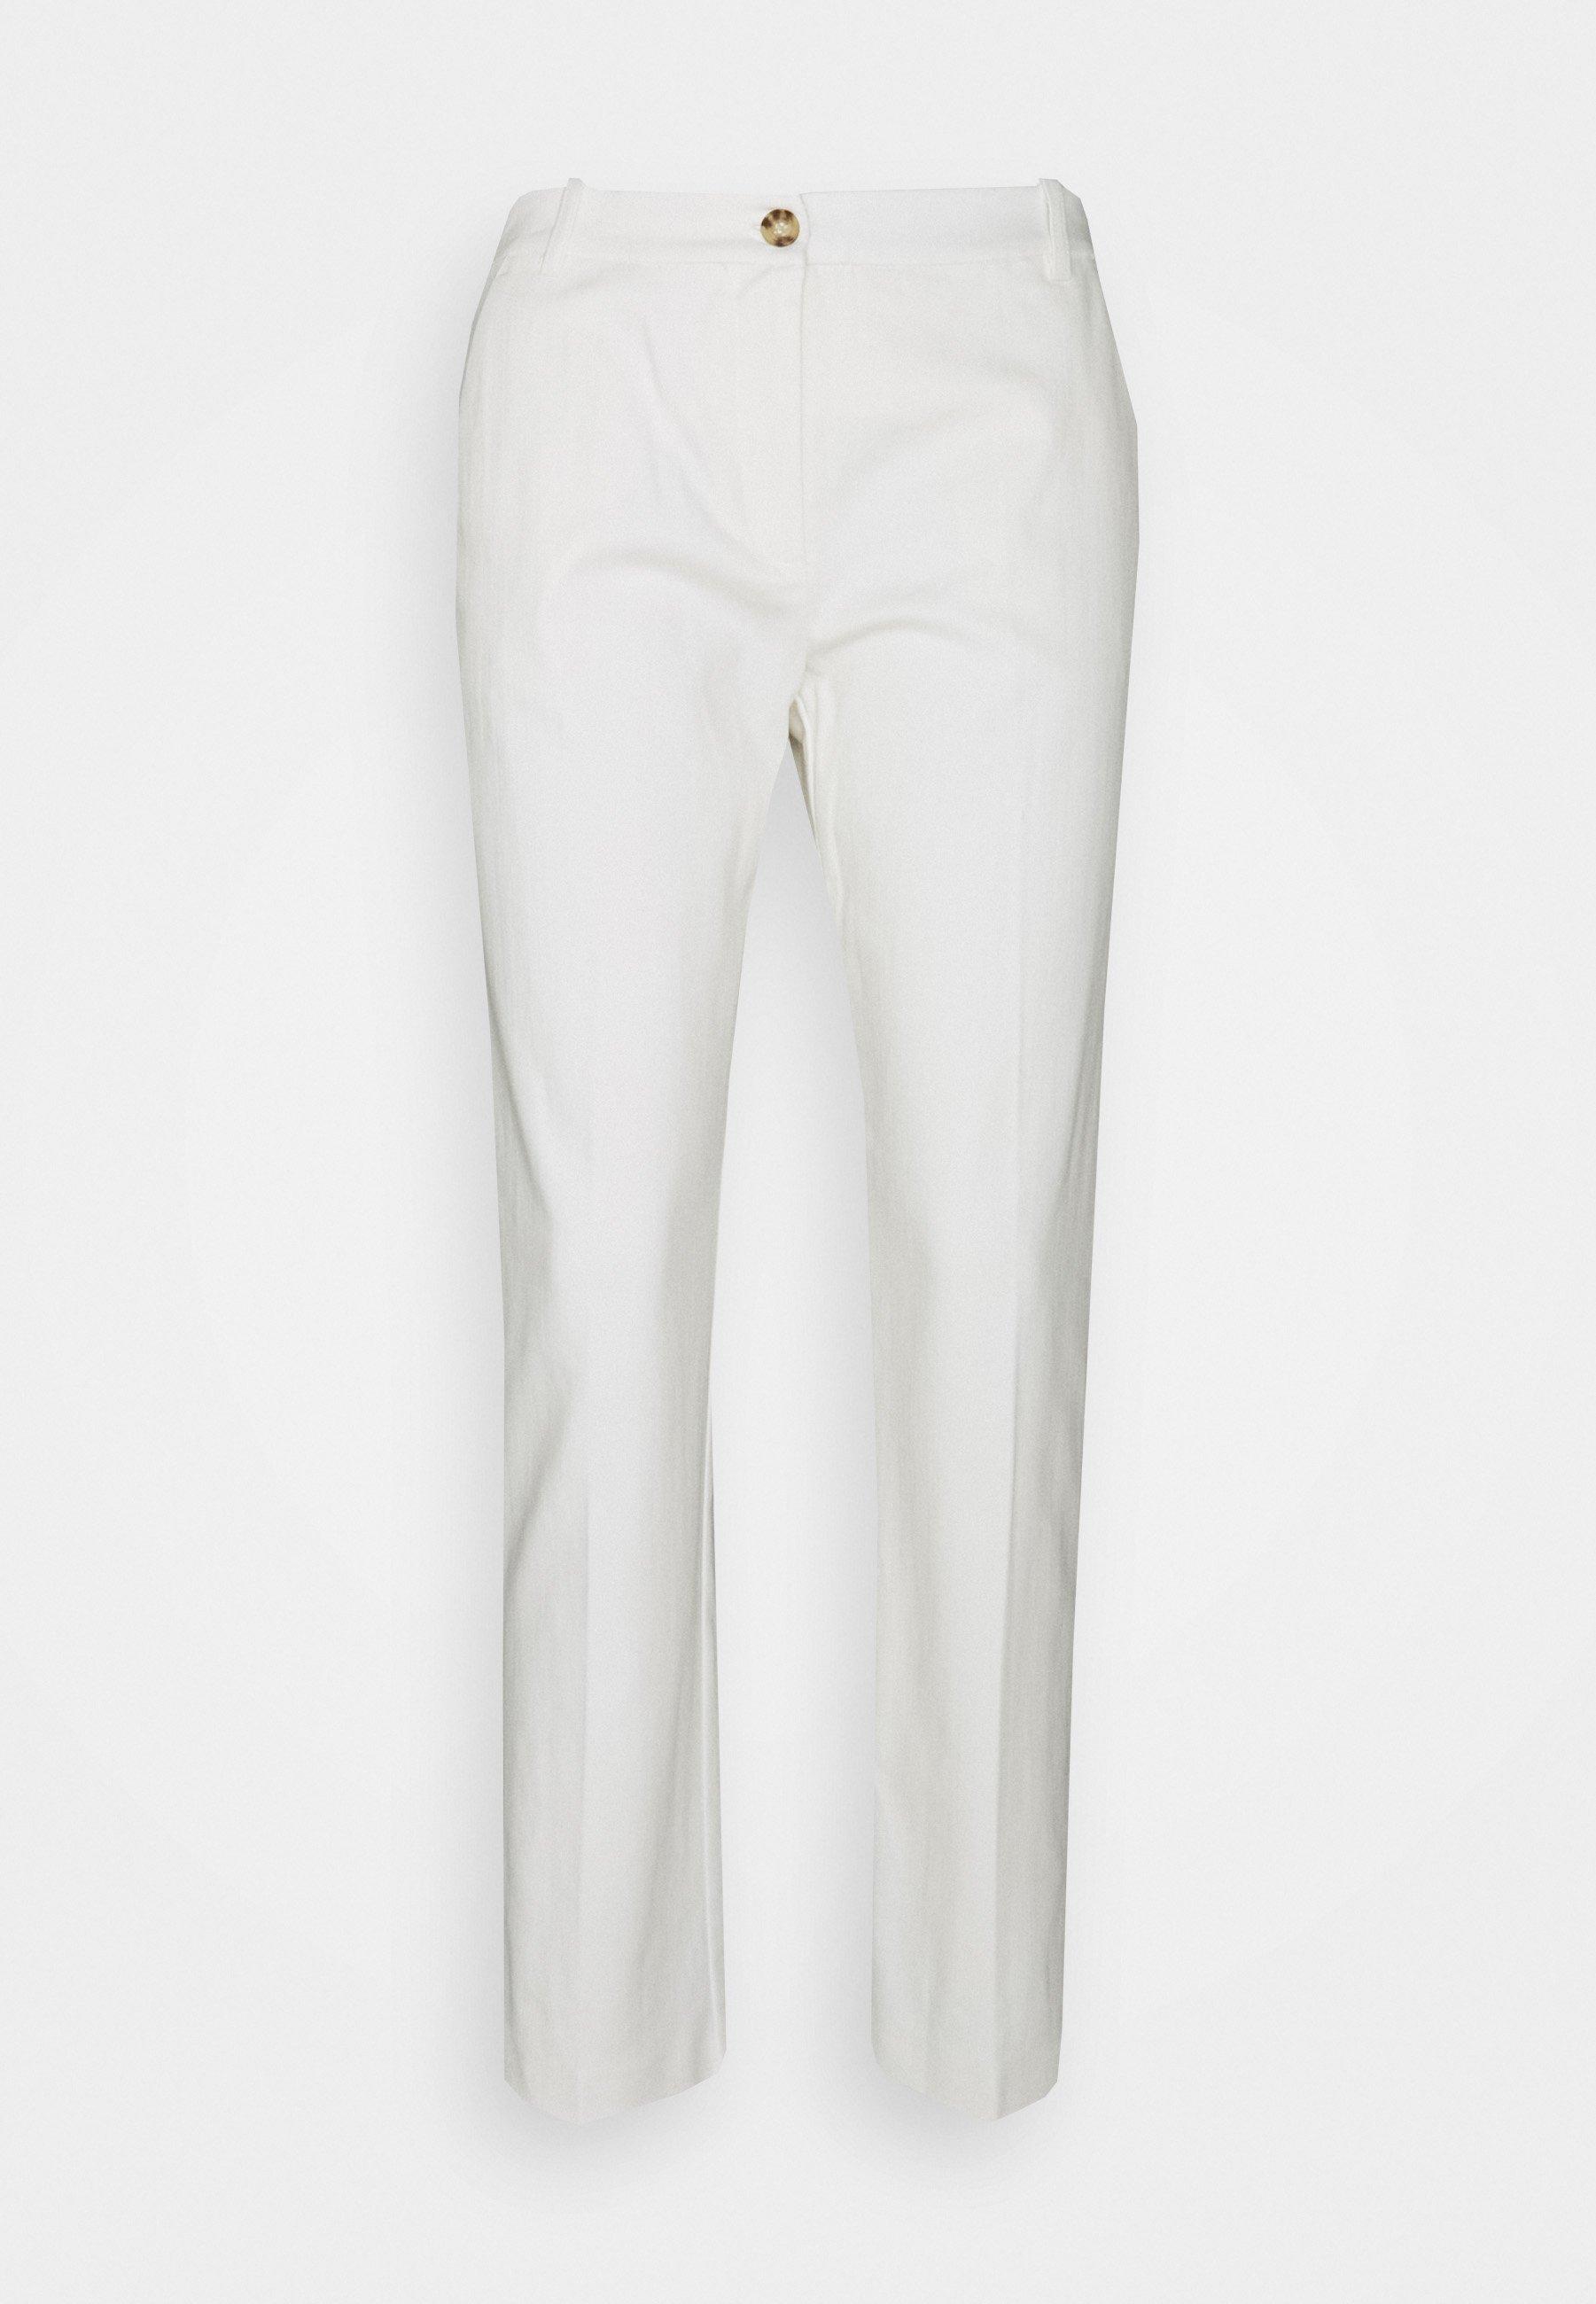 Femme BELLO PANTALONE STRETCH - Pantalon classique